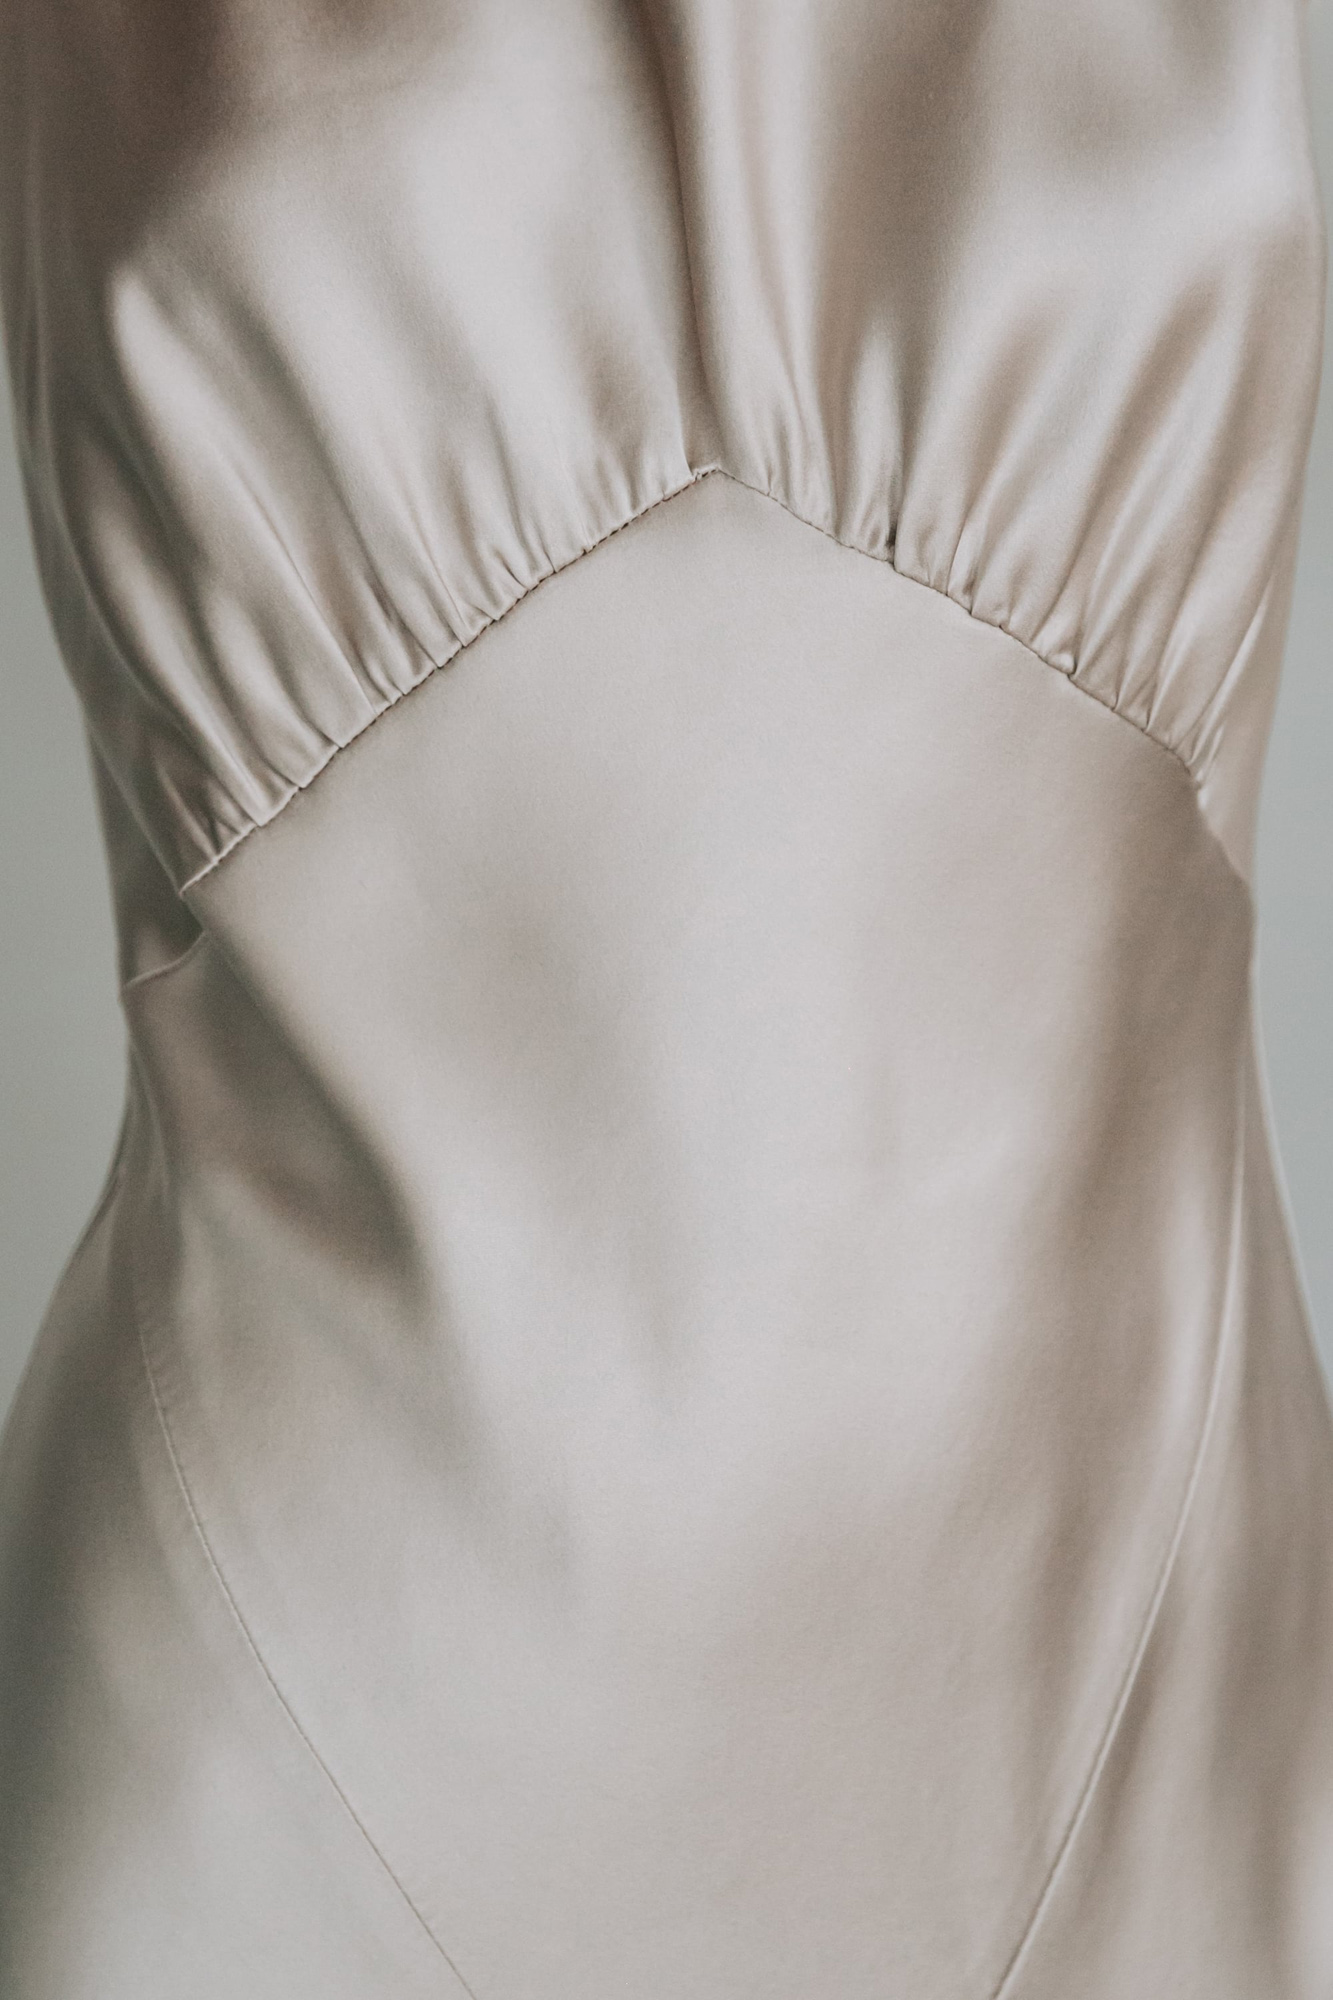 Kate-Beaumont-Sheffield-Honeysuckle-Bias-Cut-Silk-Panelled-Wedding-Gown-6.jpg